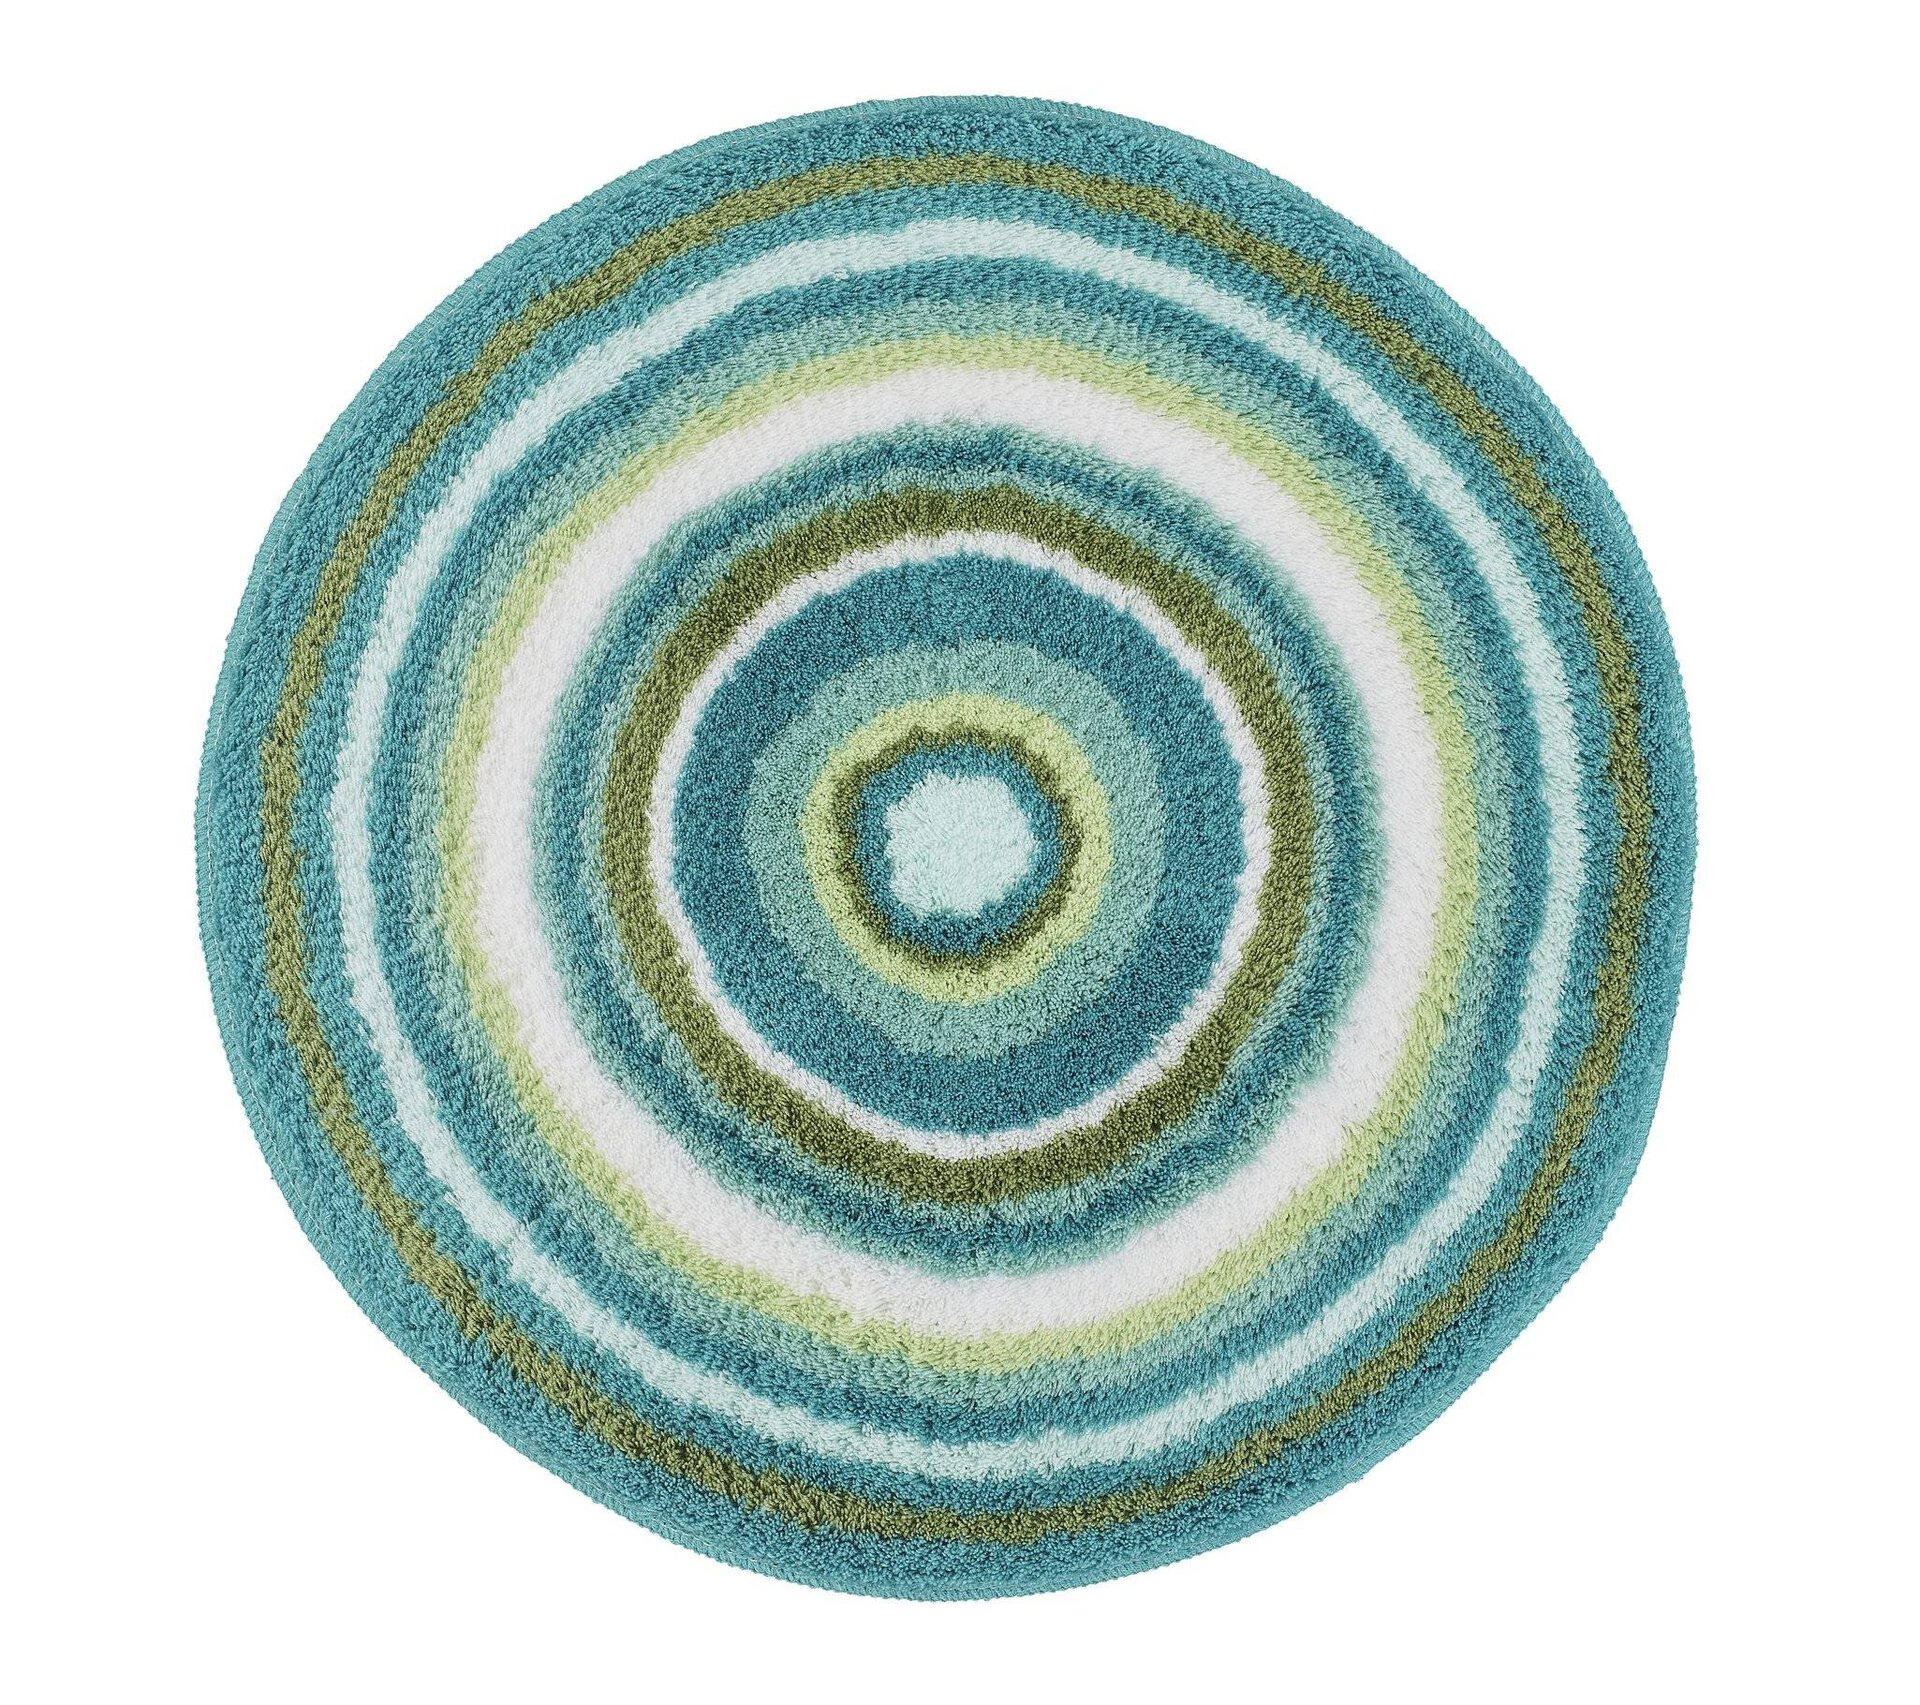 Badteppich Mandala Kleine Wolke Textil 60 x 2 x 60 cm